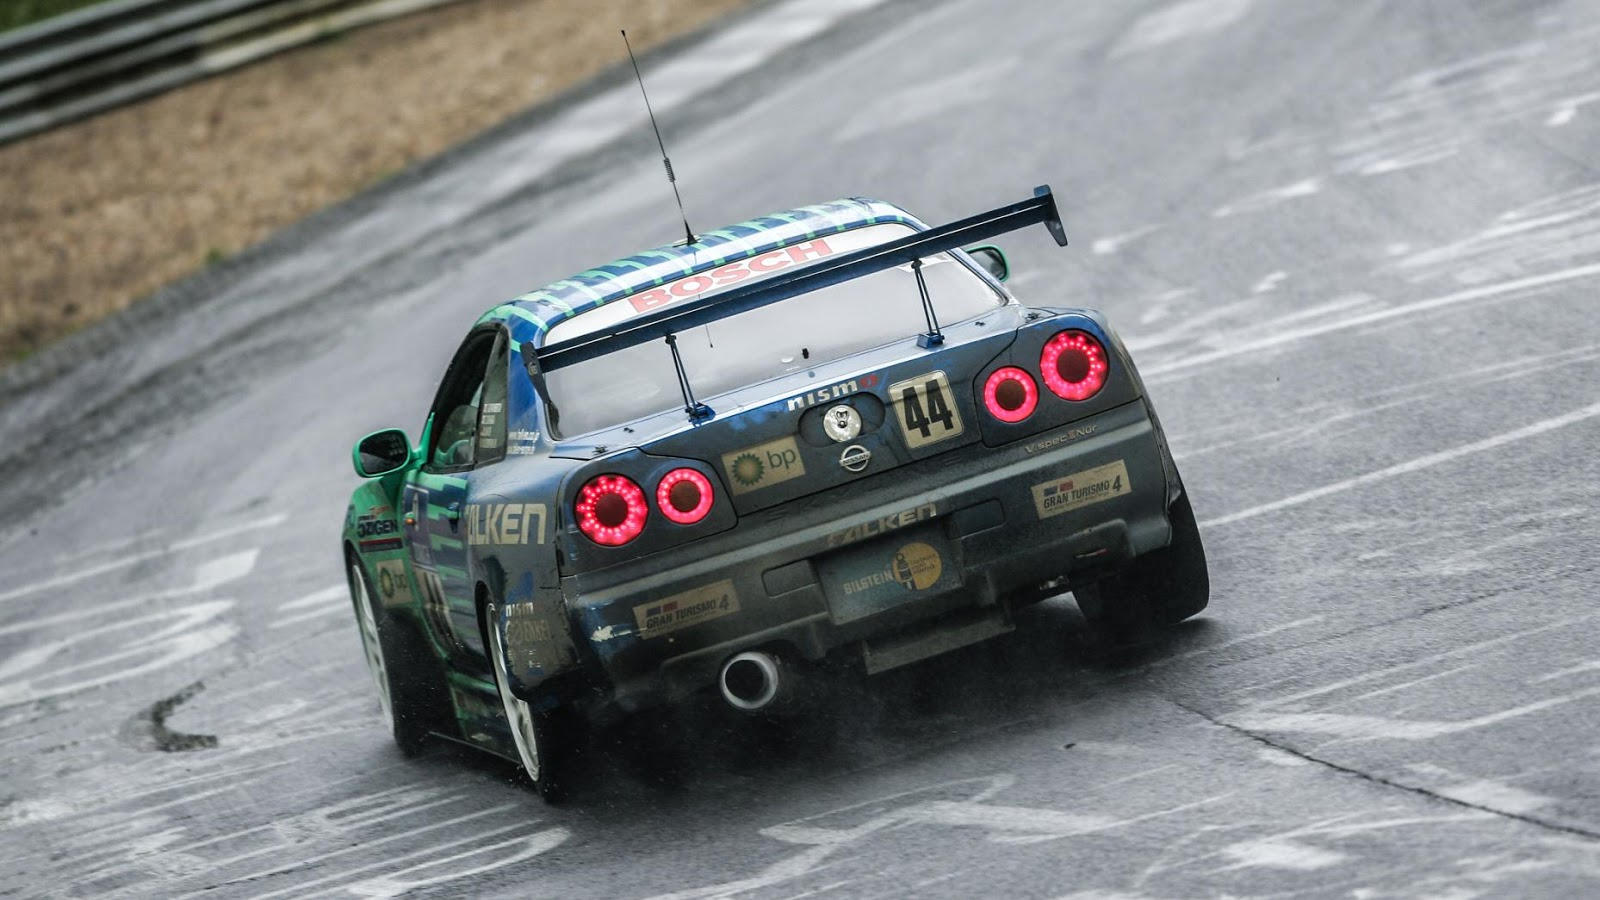 2005 - Nissan Skyline GT-R R34